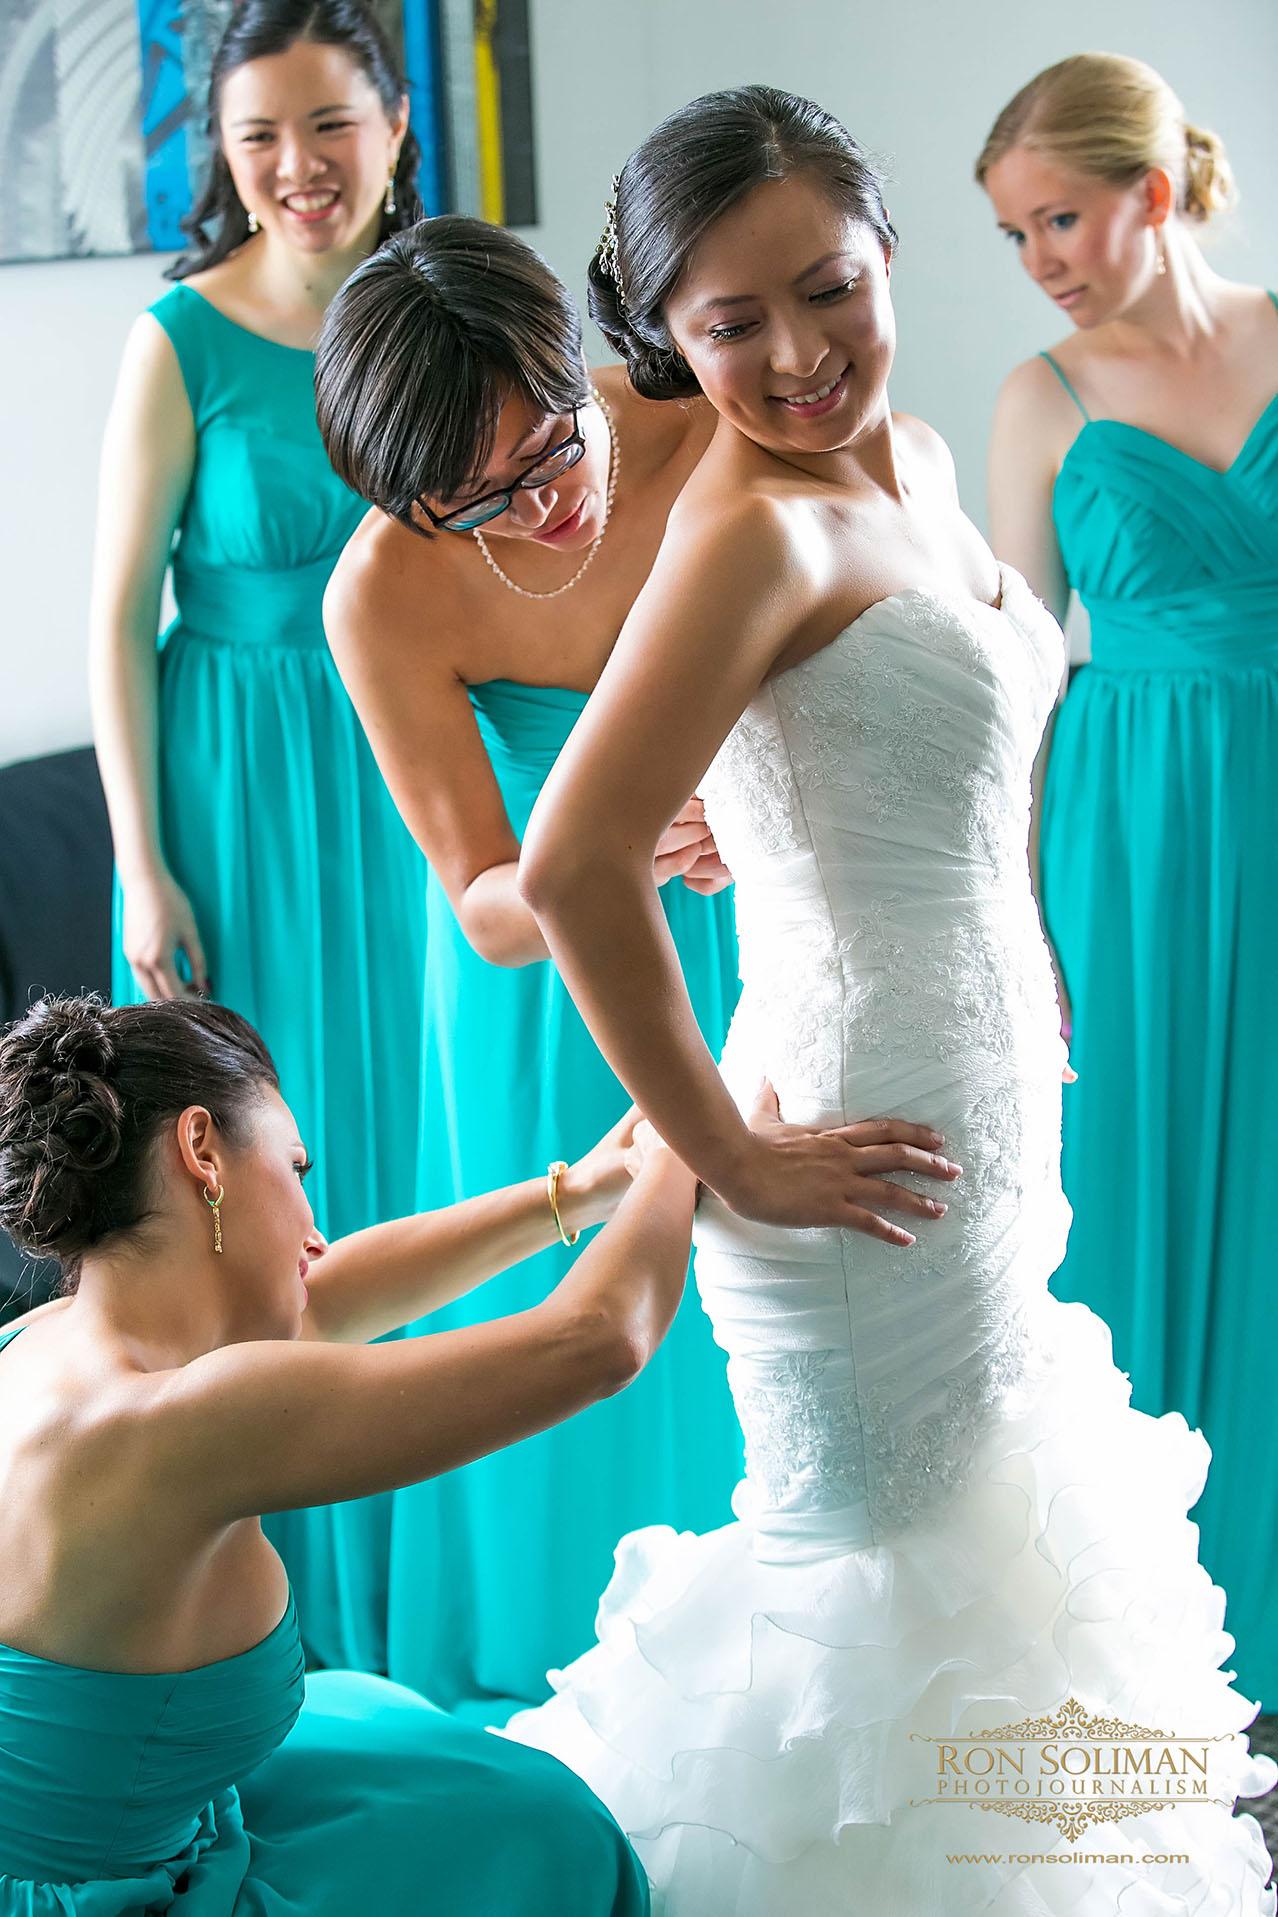 Best Wedding photos in Philadelphia